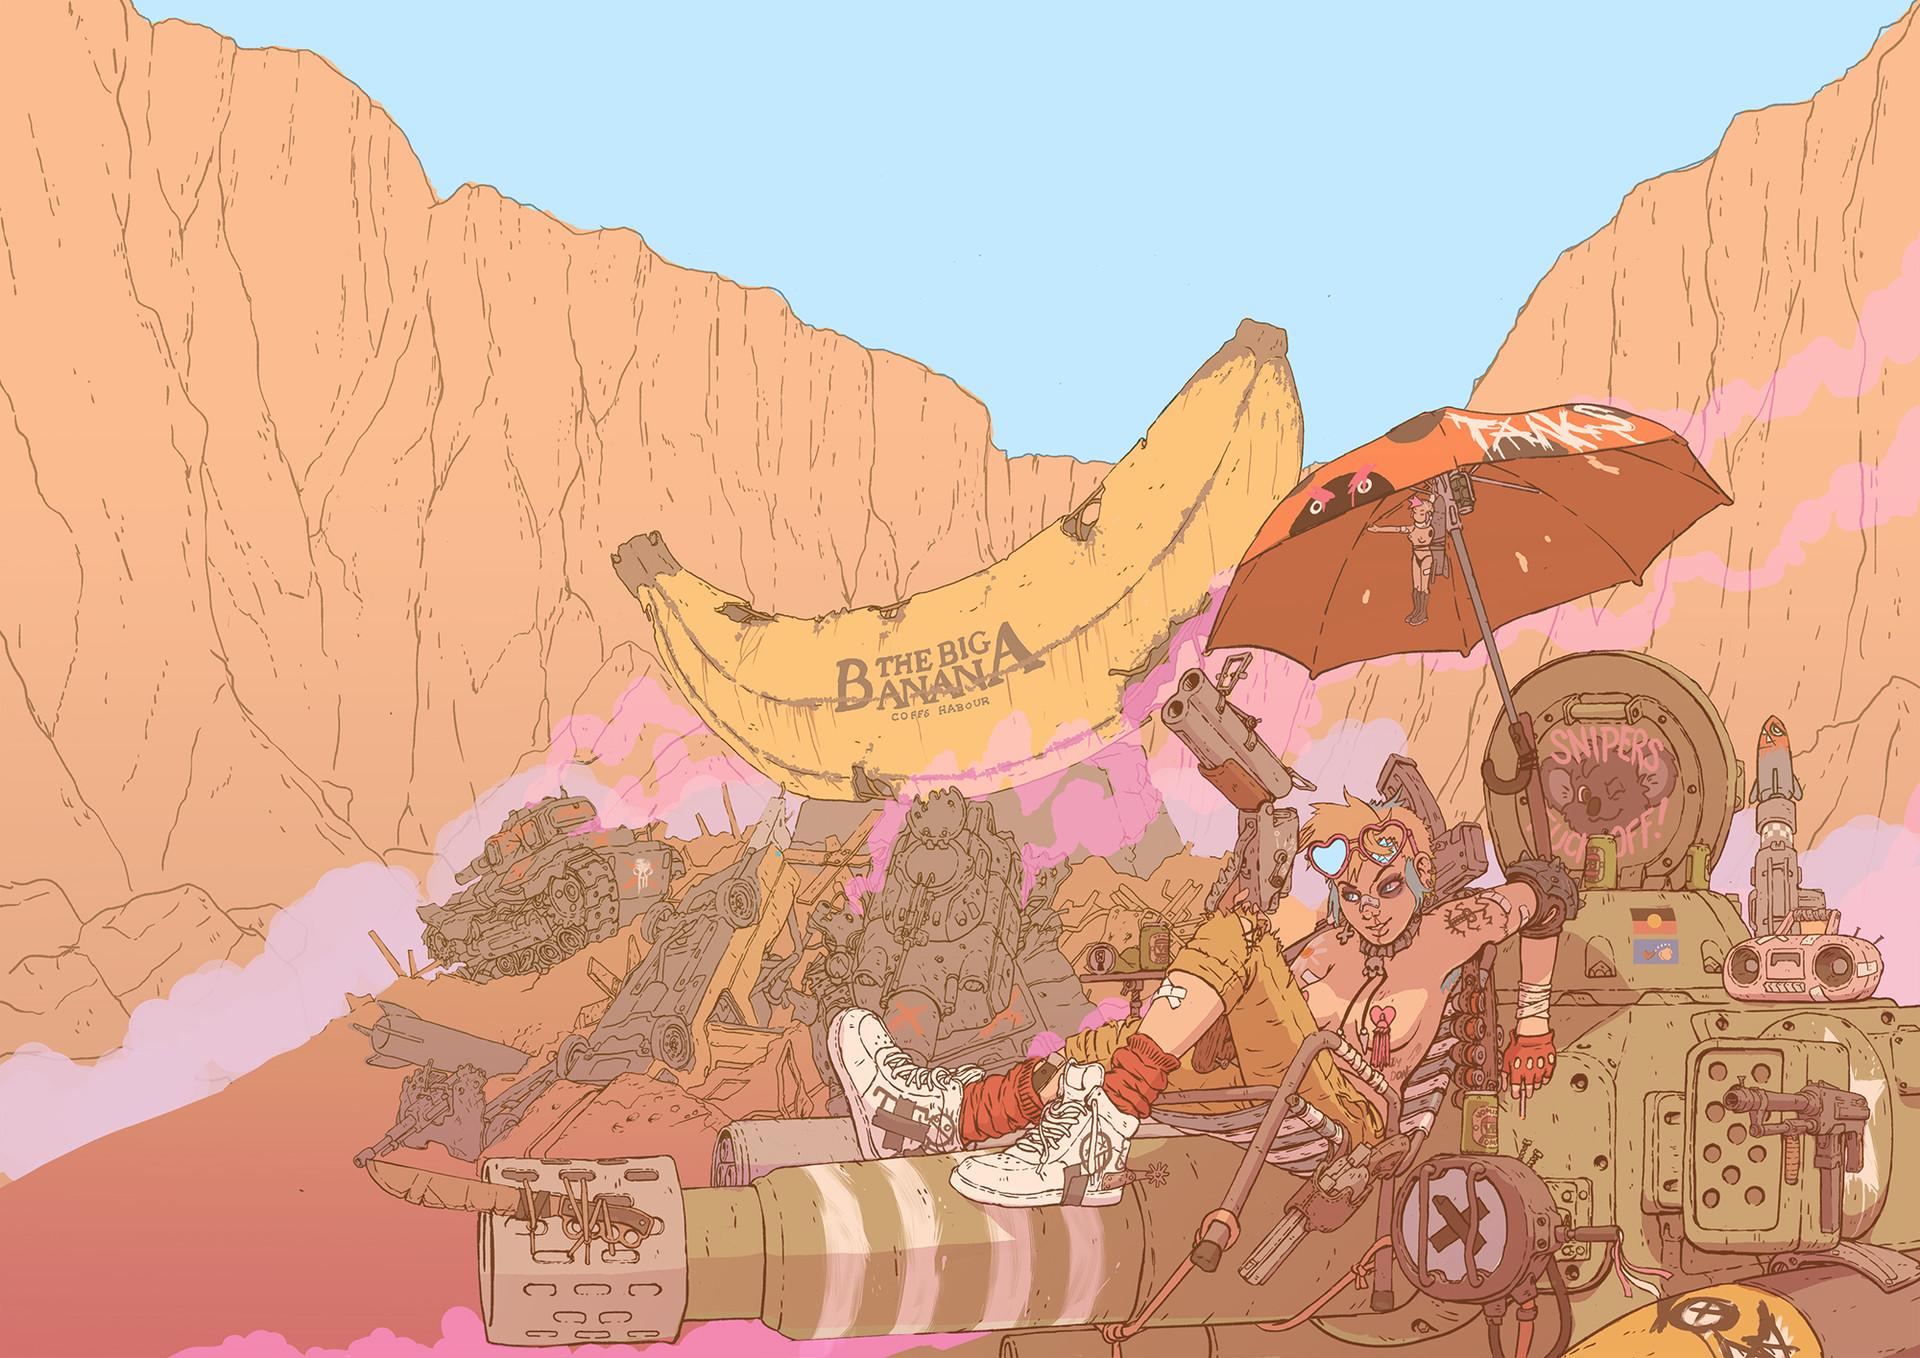 Max prentis tank girl and the battle of big banana